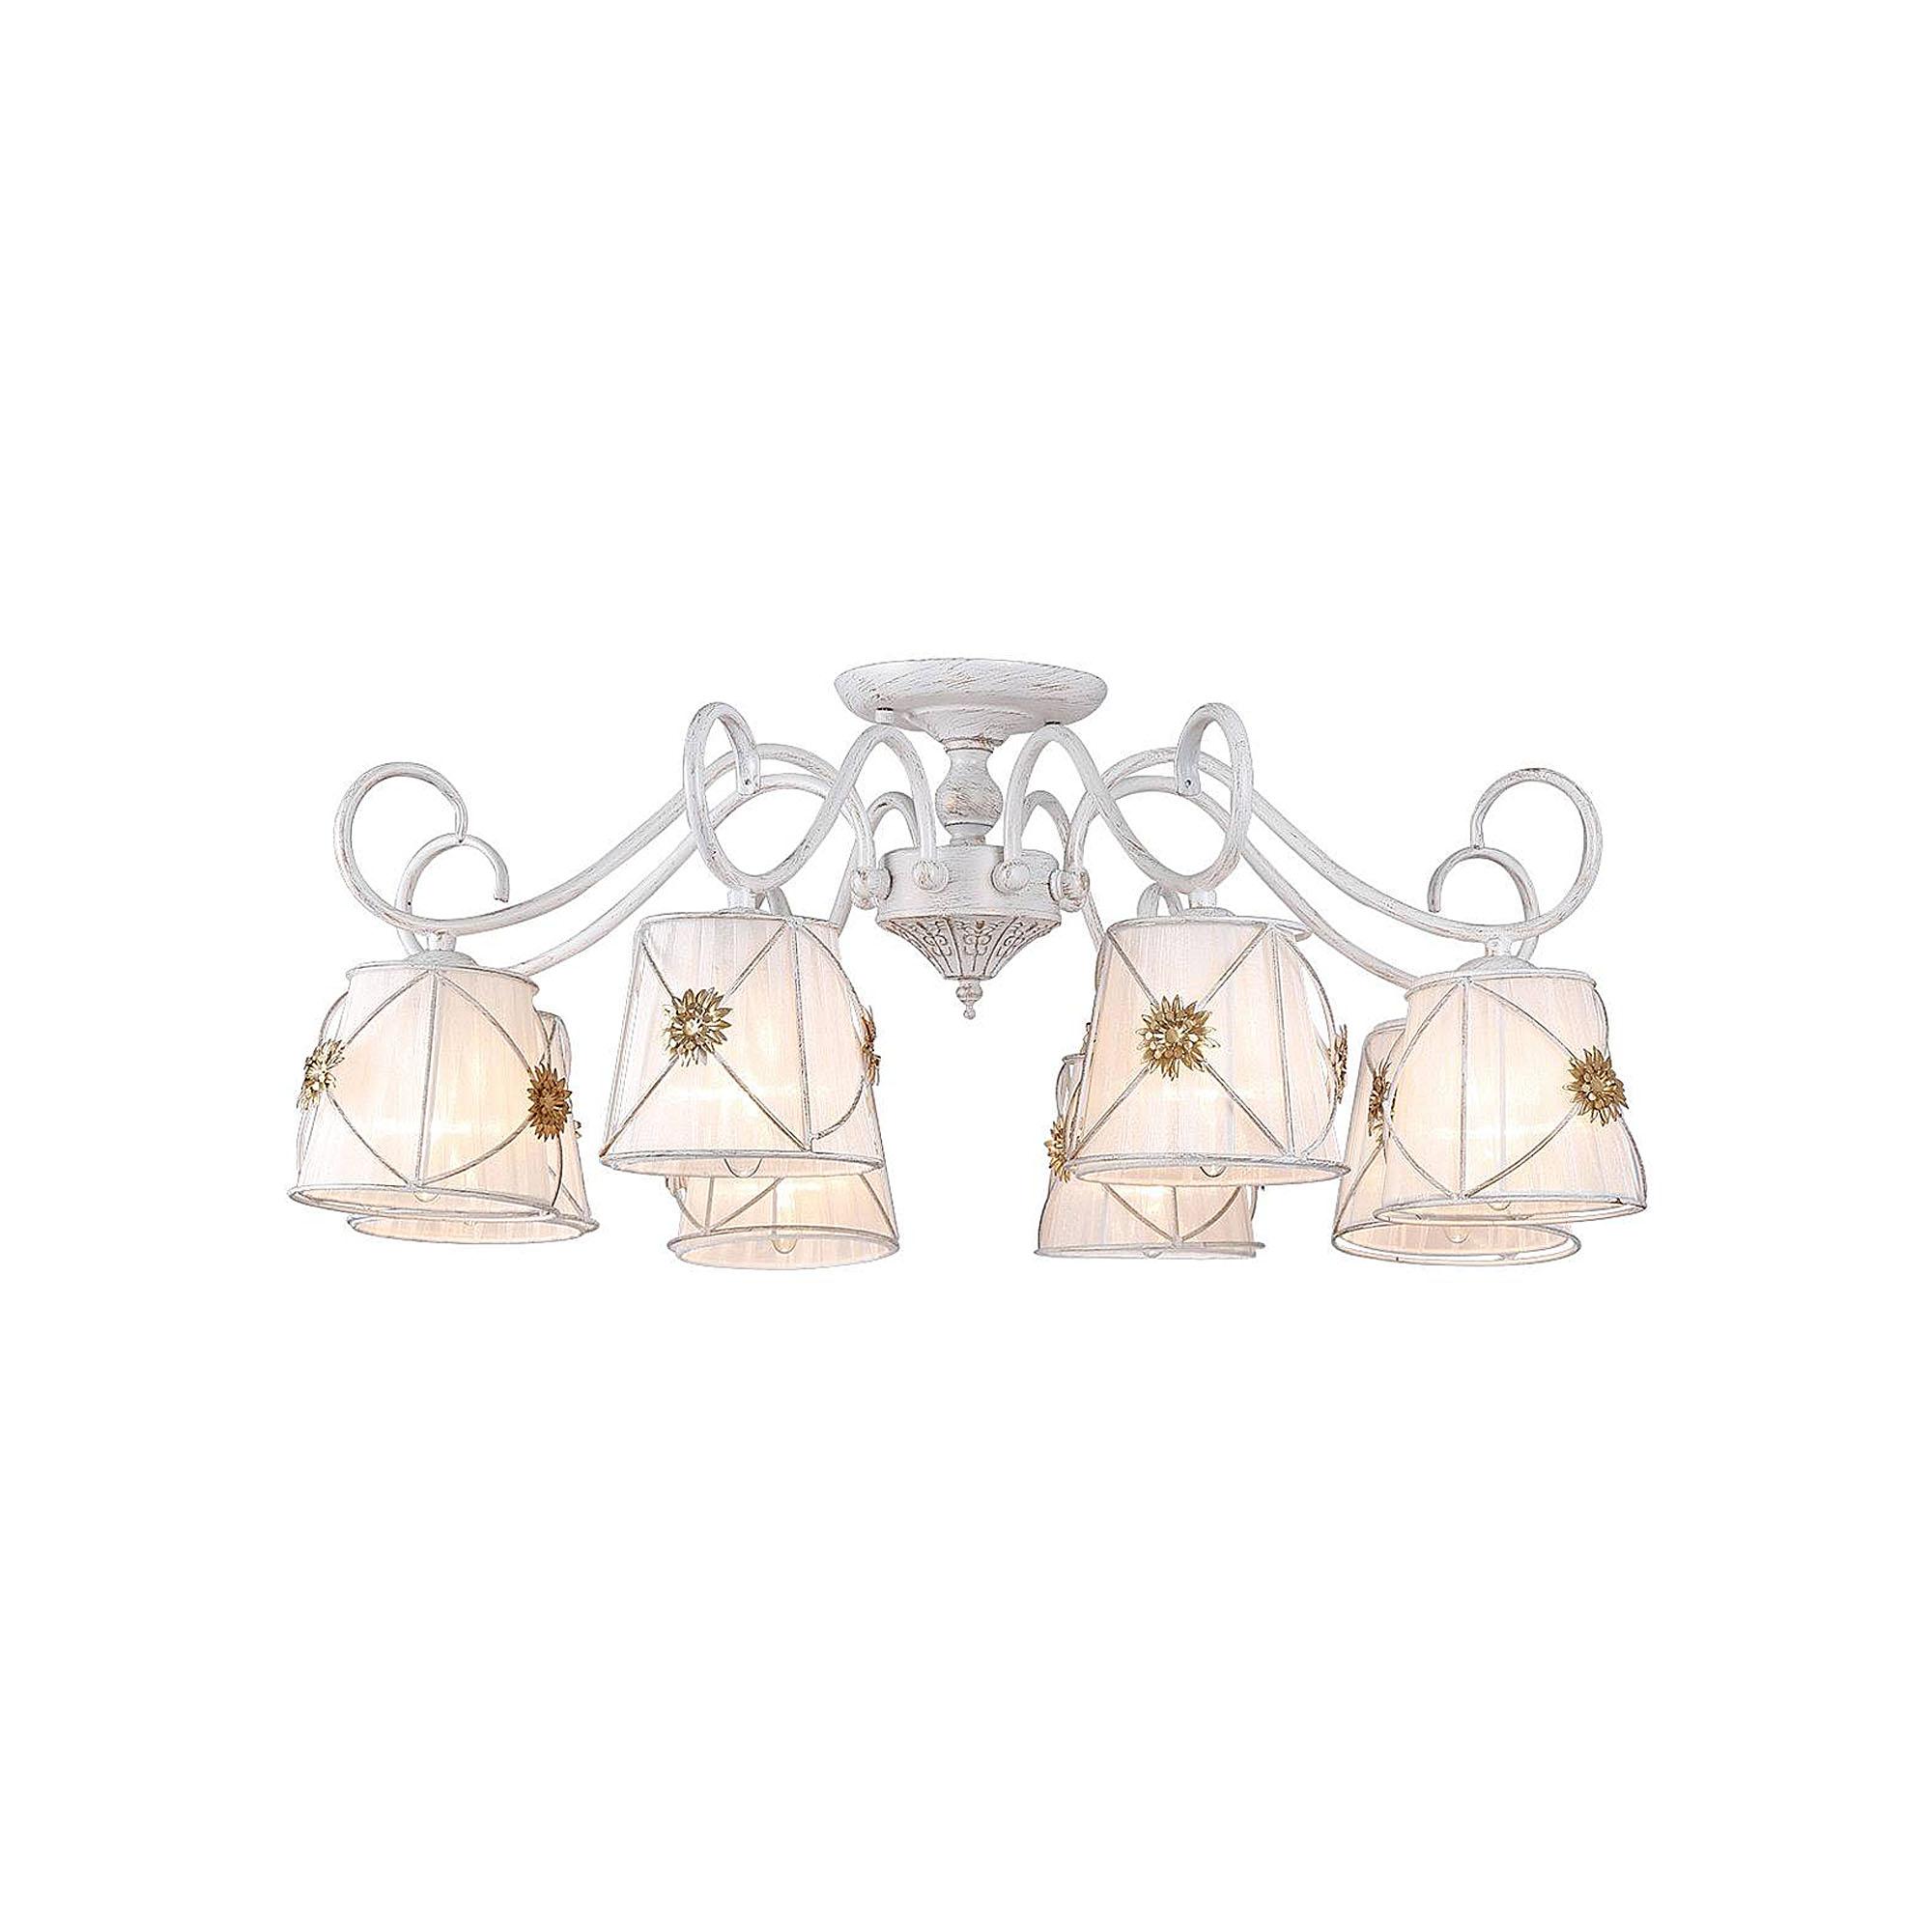 Люстра потолочная Arte Lamp A5495PL-8WG фото